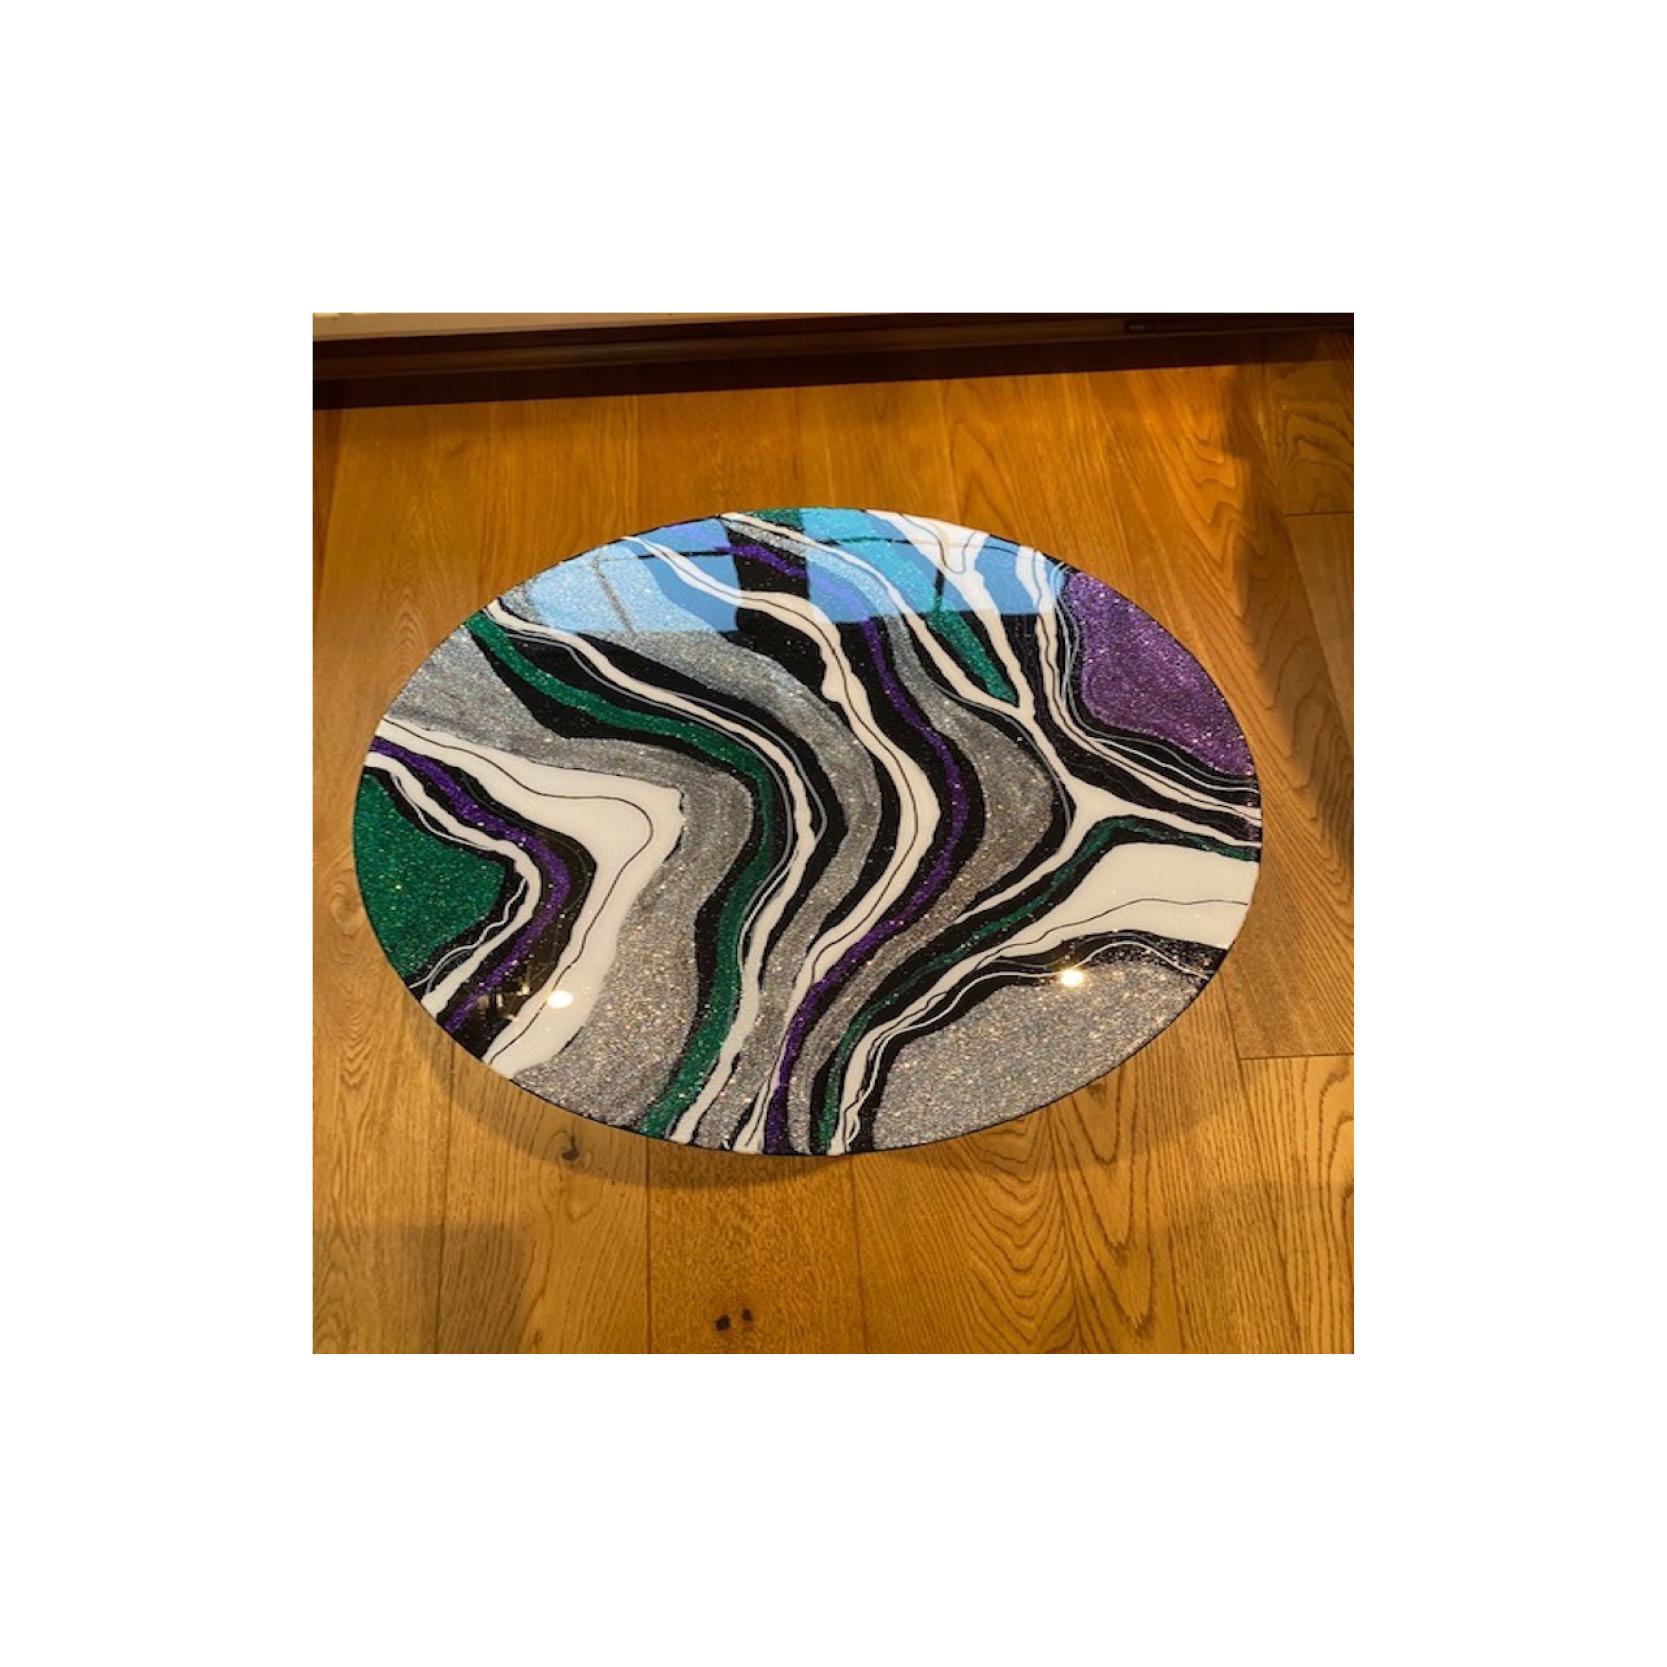 Chantal - Resin glitter table